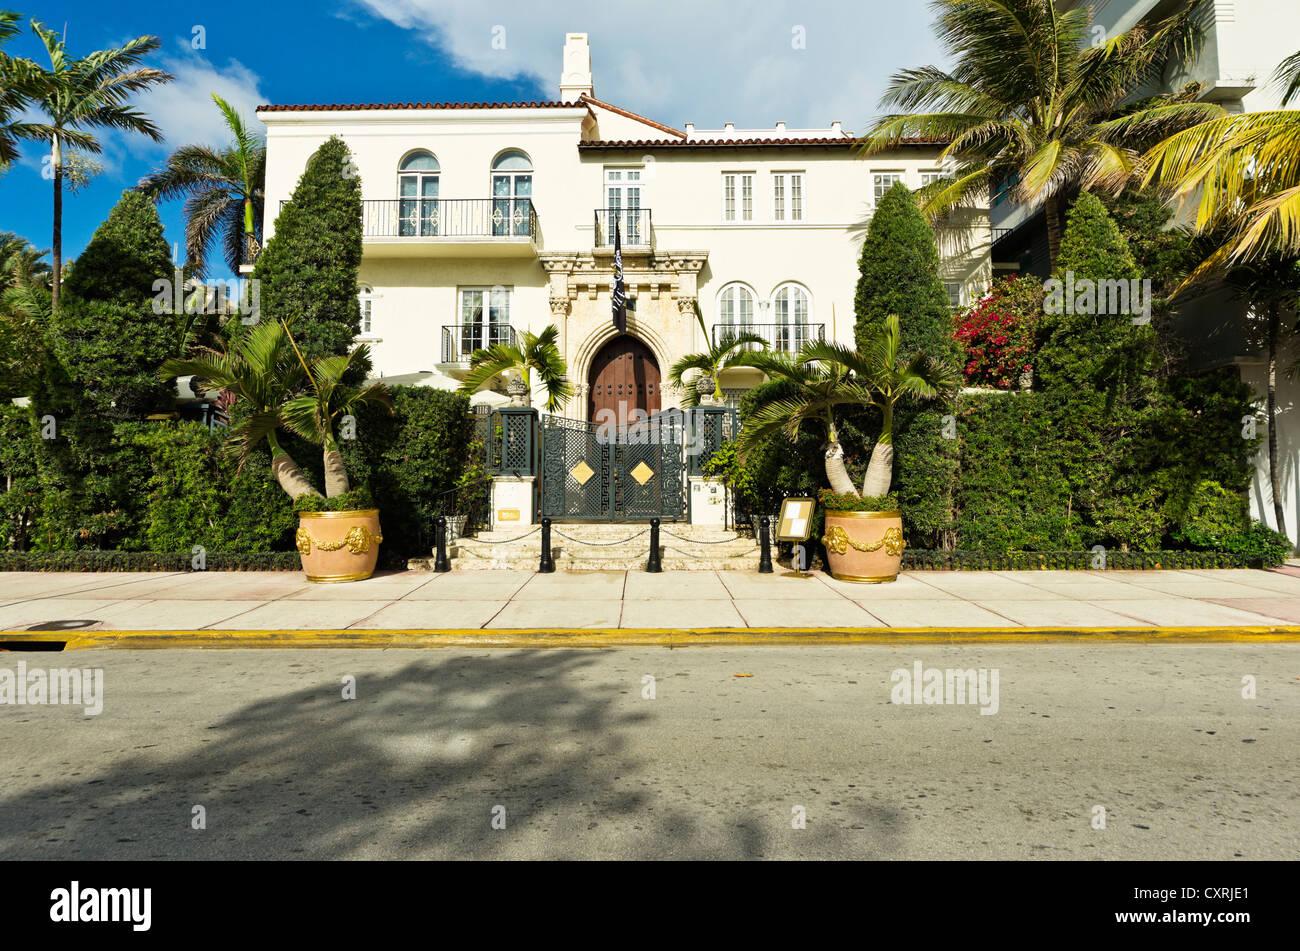 Casa Casuarina, Versace Mansion, Ocean Drive, South Beach, Art Deco district, Miami Beach, Florida, USA - Stock Image